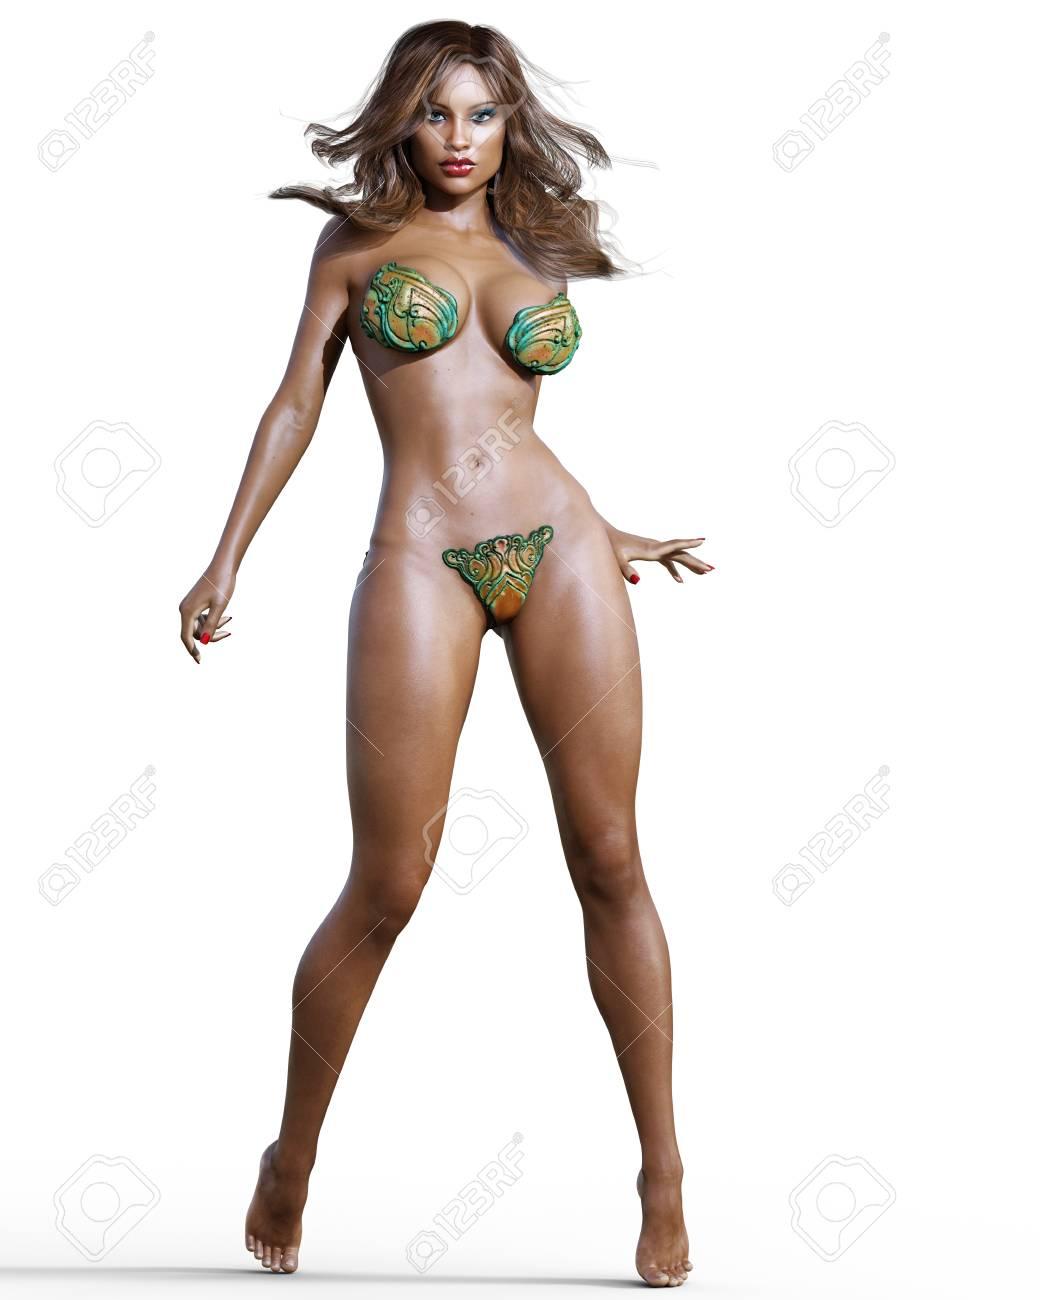 efbef254fb480 Tall sexy woman in minimalist futuristic lingerie. Metal bra and panties.  Conceptual fashion art